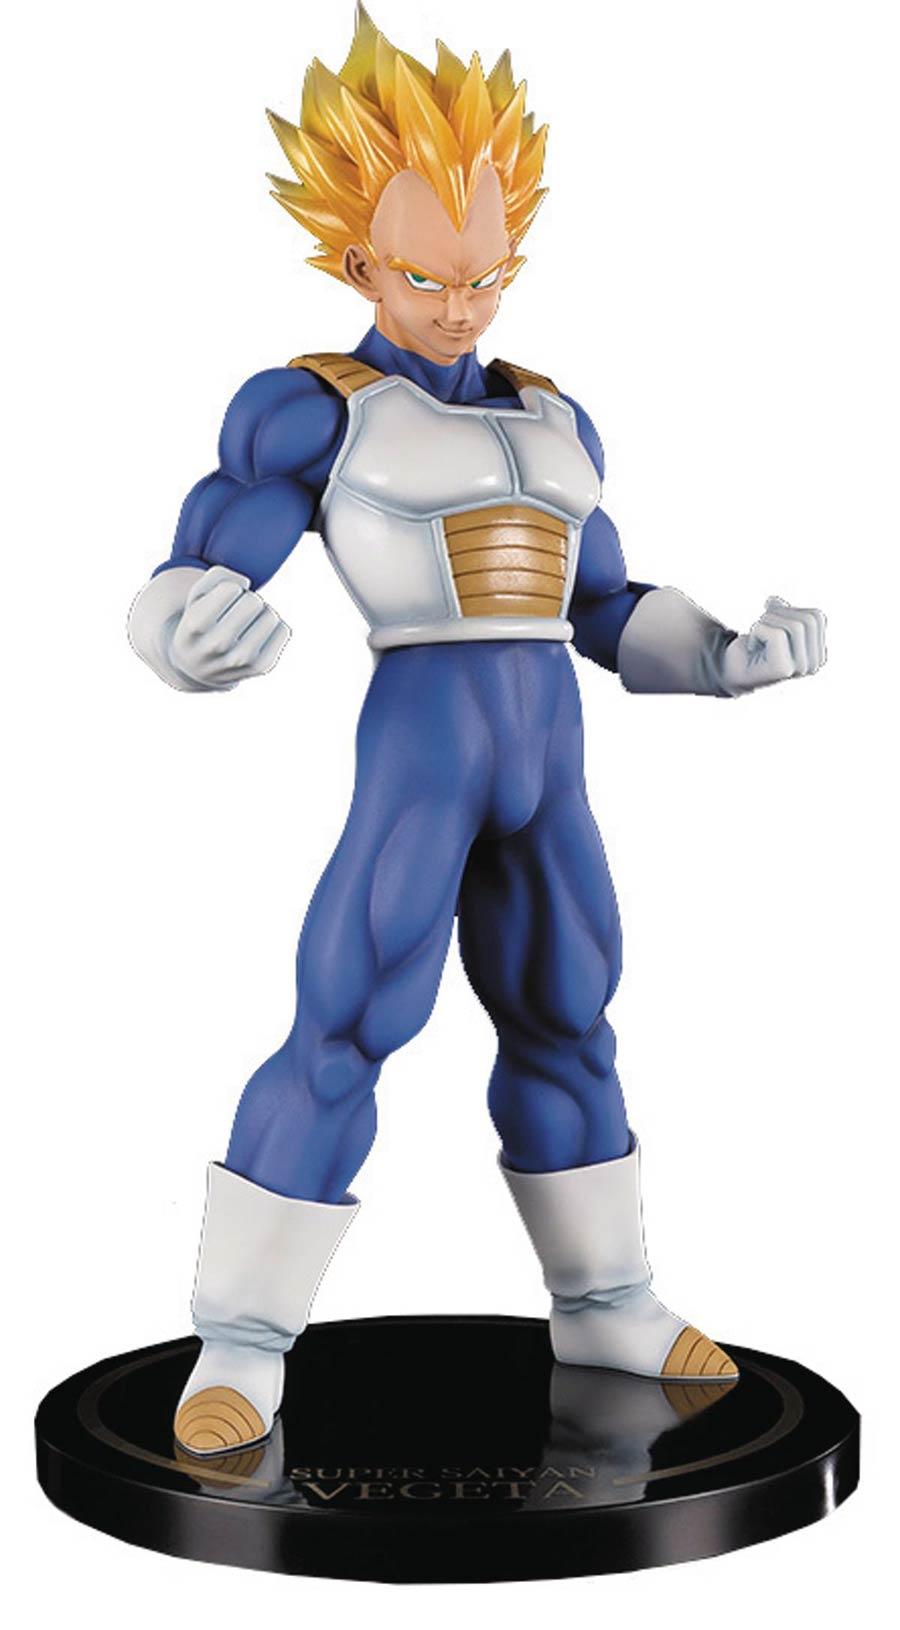 Dragon Ball Z Figuarts ZERO EX - Super Saiyan Vegeta Figure